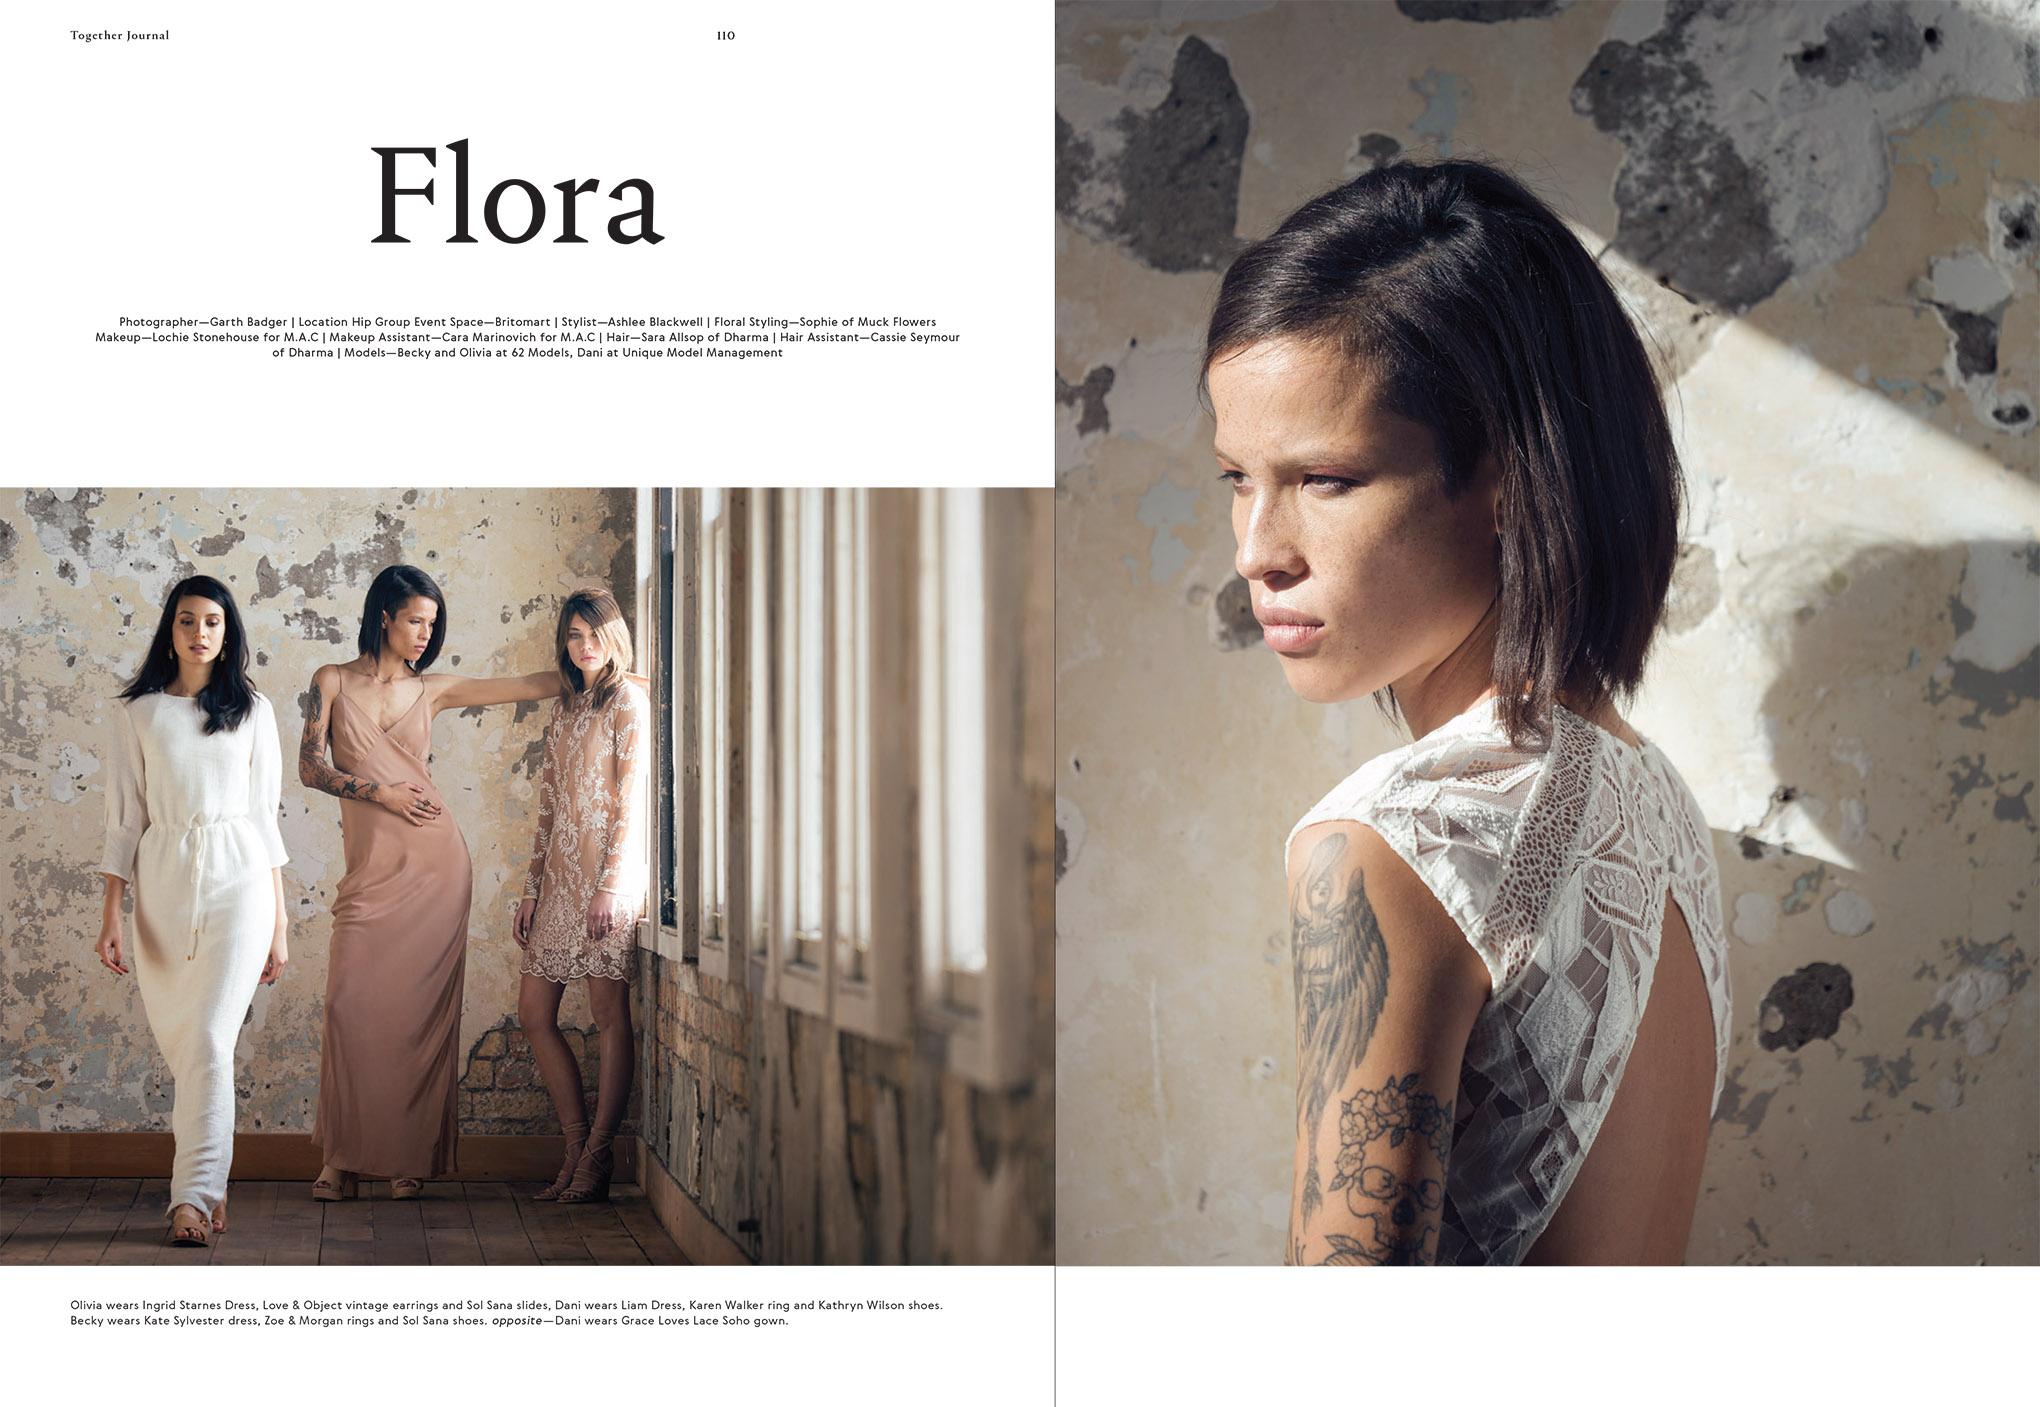 tj4_110-121_editorial_flora-1